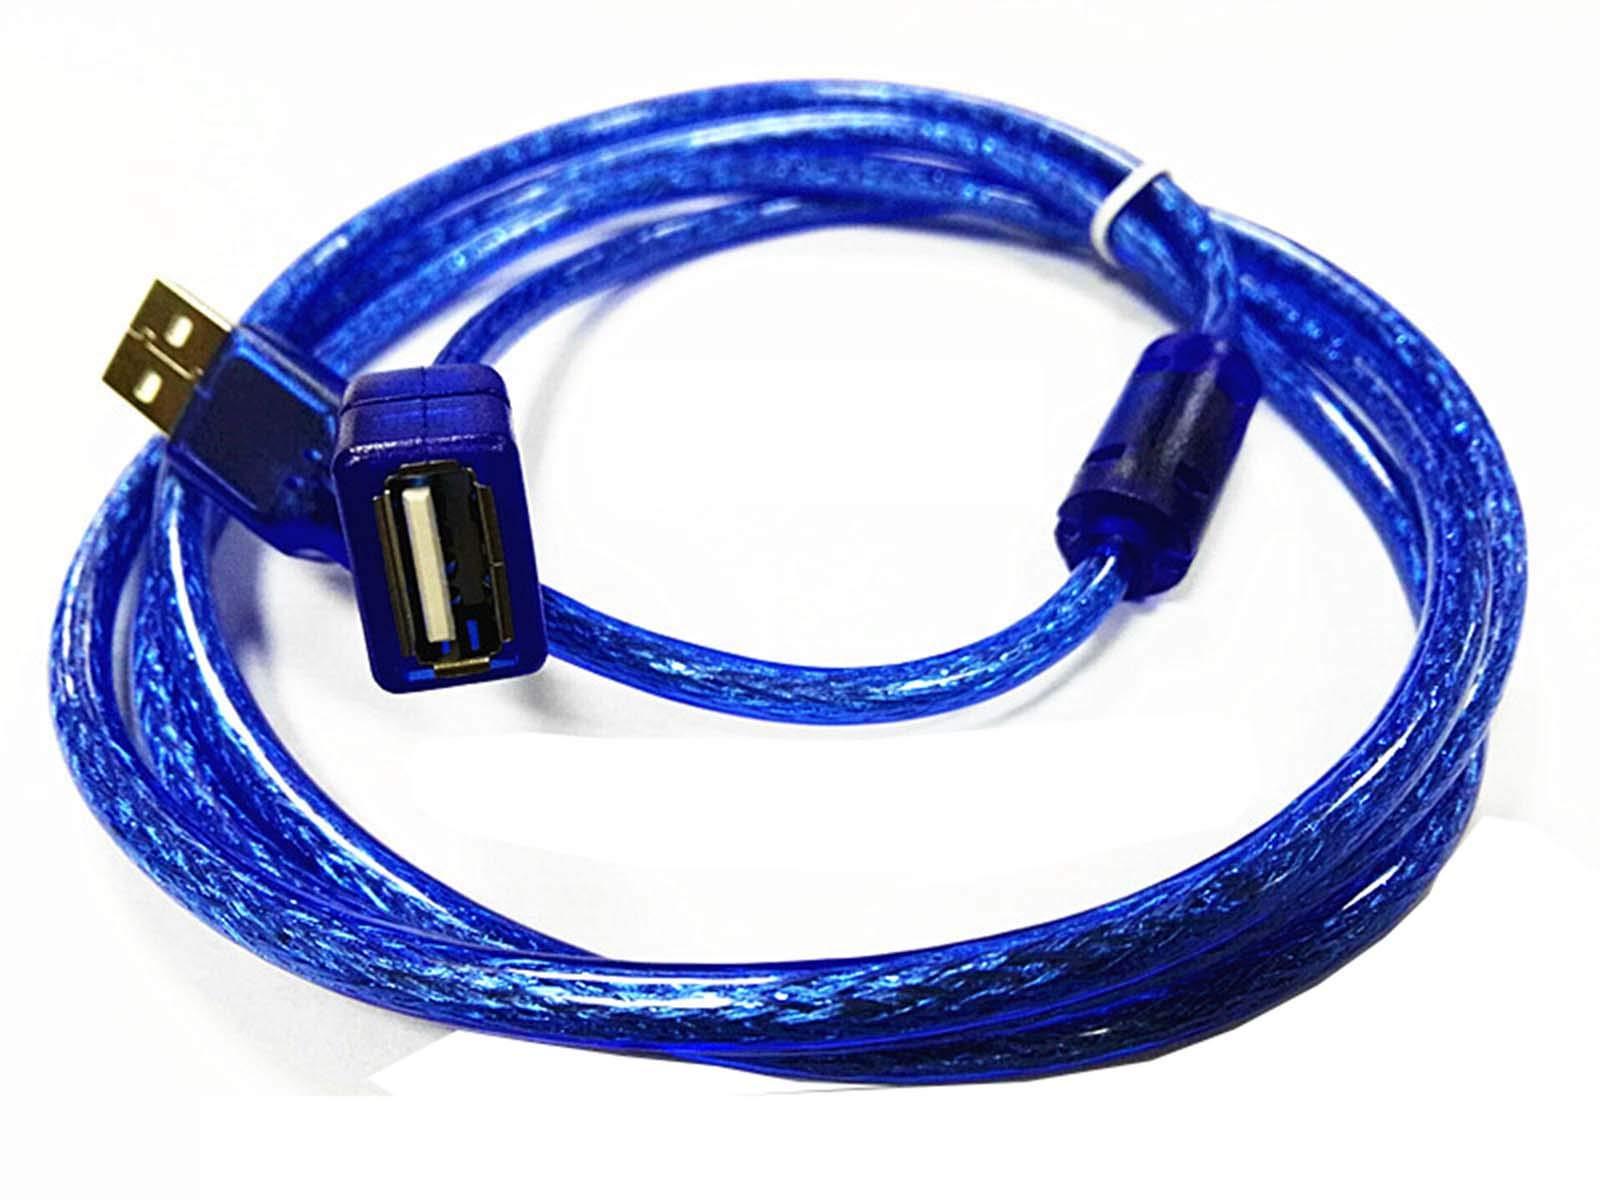 3FT USB 2.0, Mini USB Cable Male Cord for Dash Cam, Digital Camera, SatNav, GPS Receiver